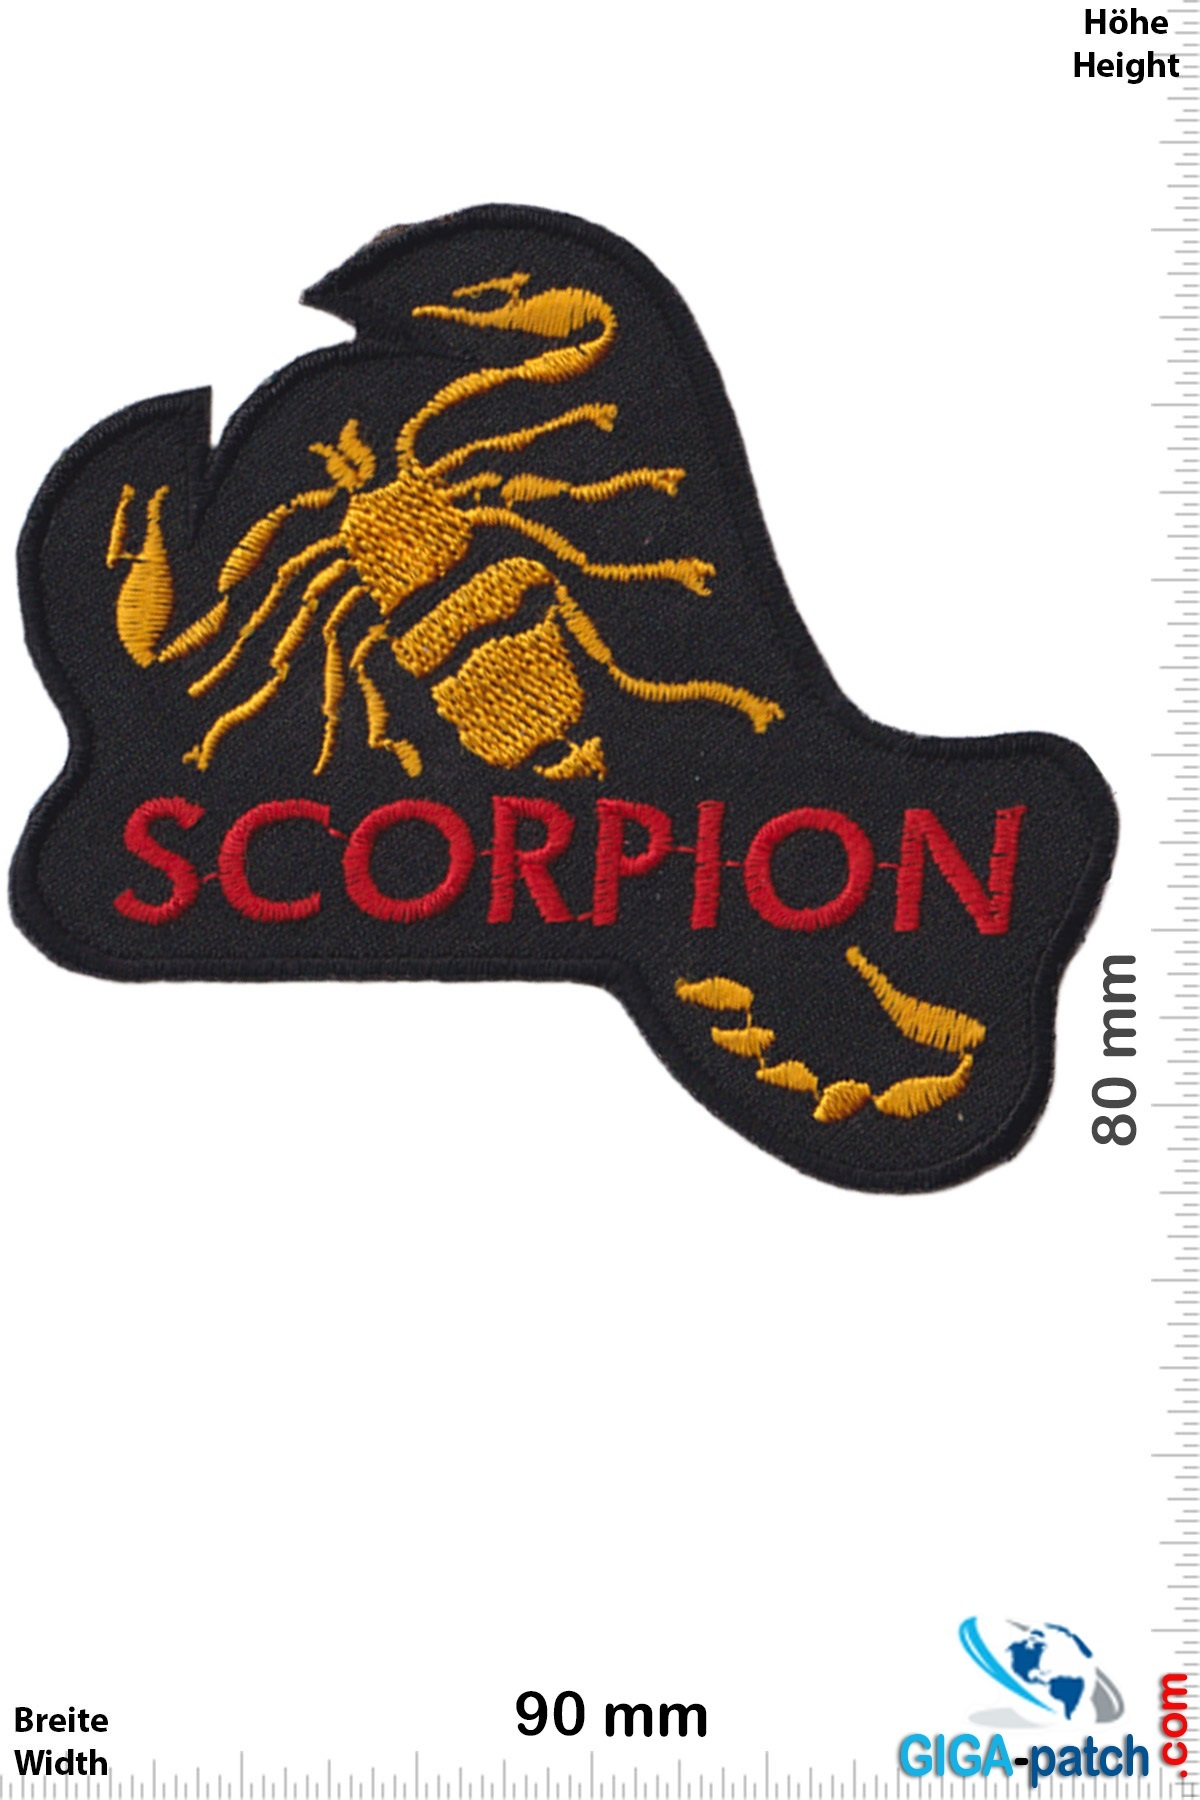 Scorpions Scorpion - rot  gold